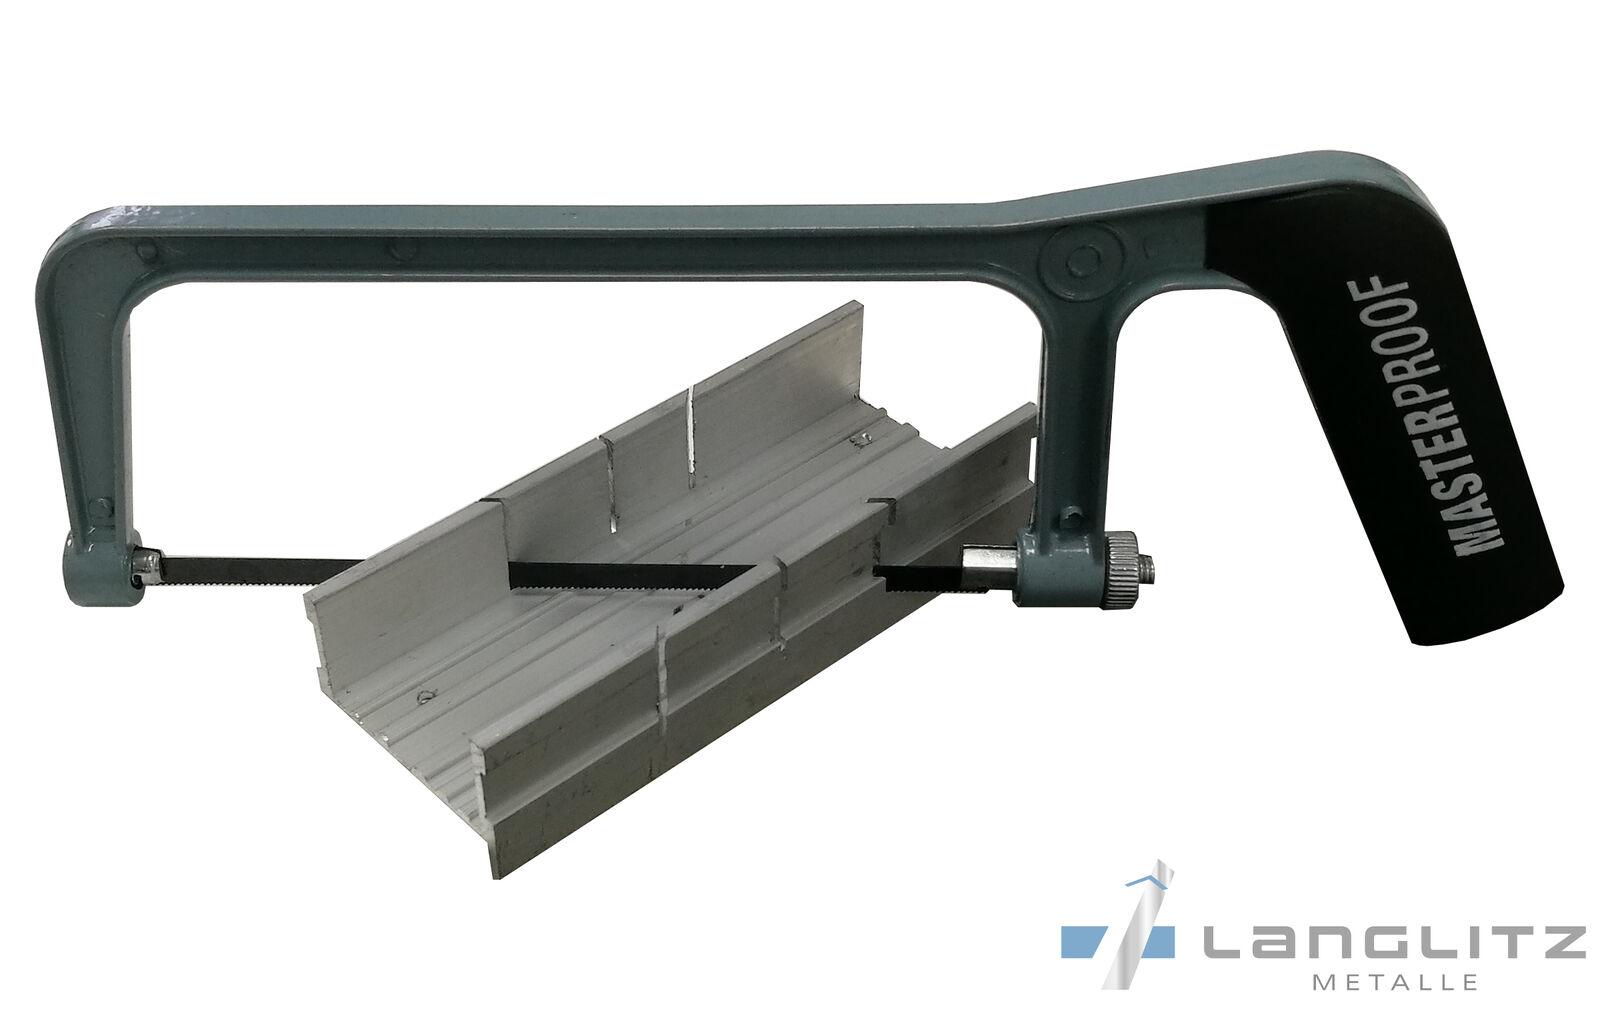 Handsäge Gehrungssäge für Aluminium 0° - 300° Bastlersäge Metall Säge Bügelsäge